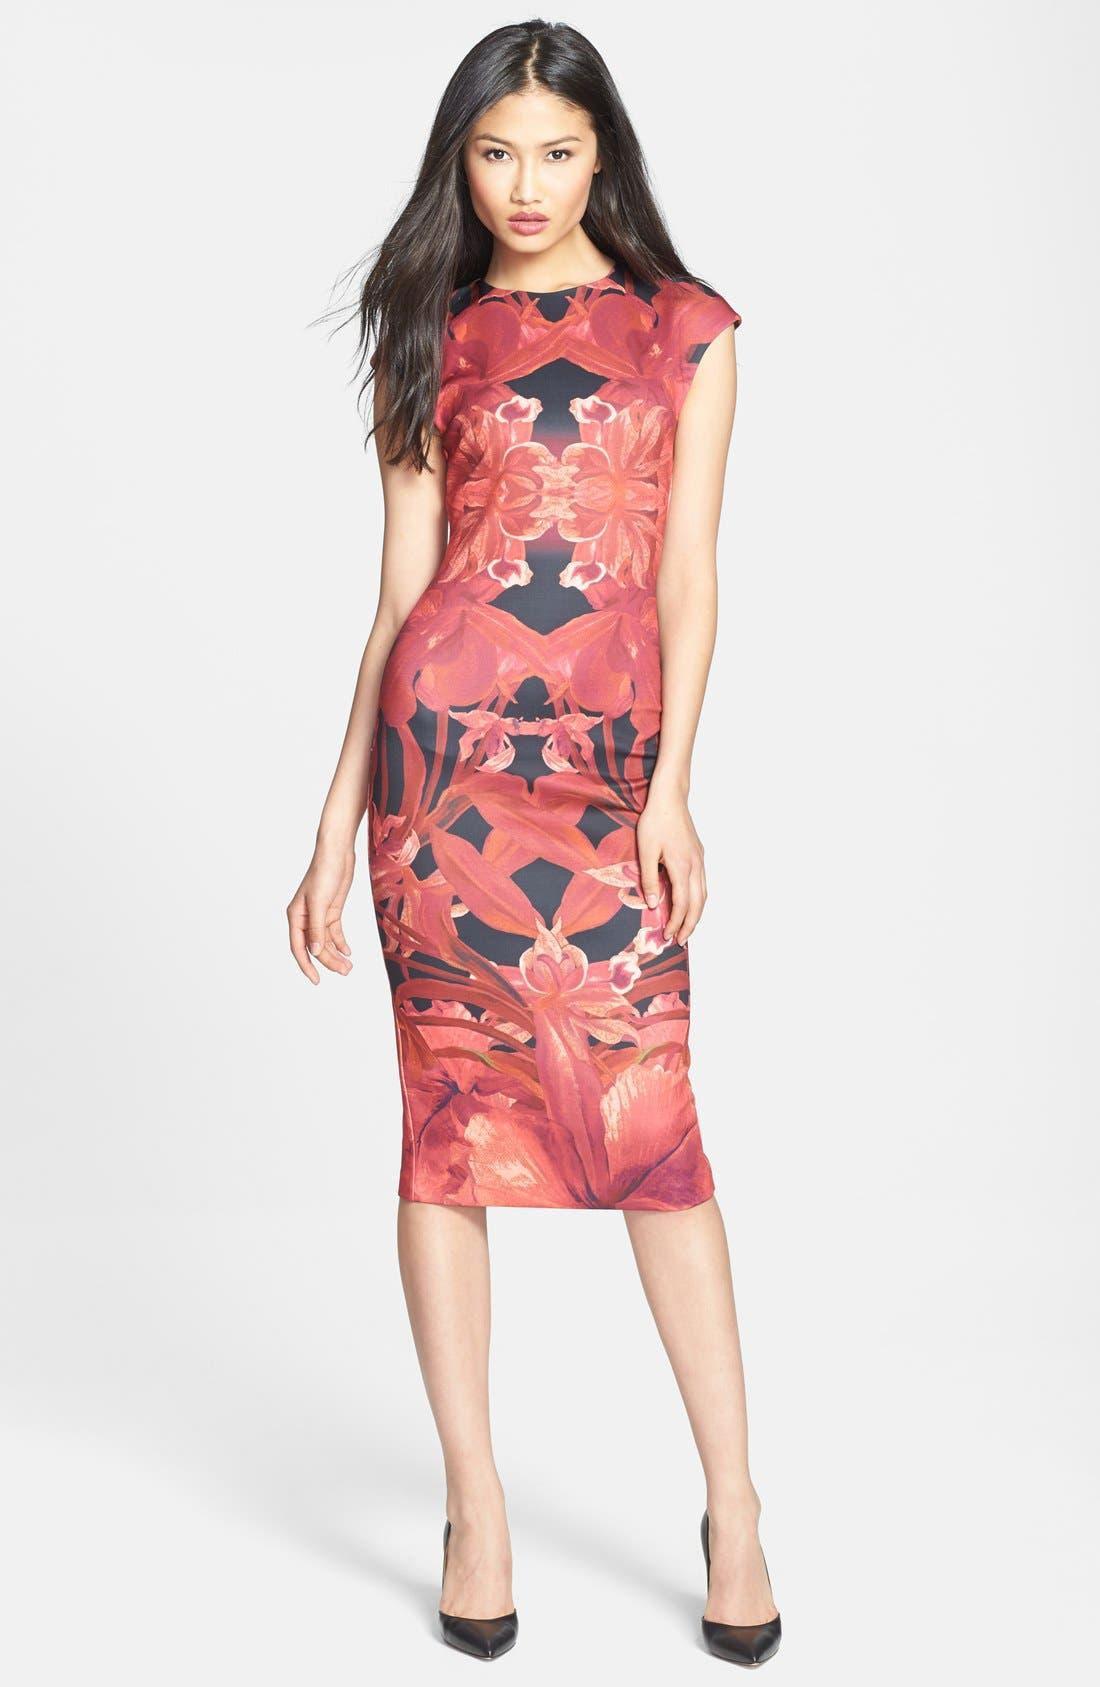 Main Image - Ted Baker London 'Jungle Orchid' Print Neoprene Midi Dress